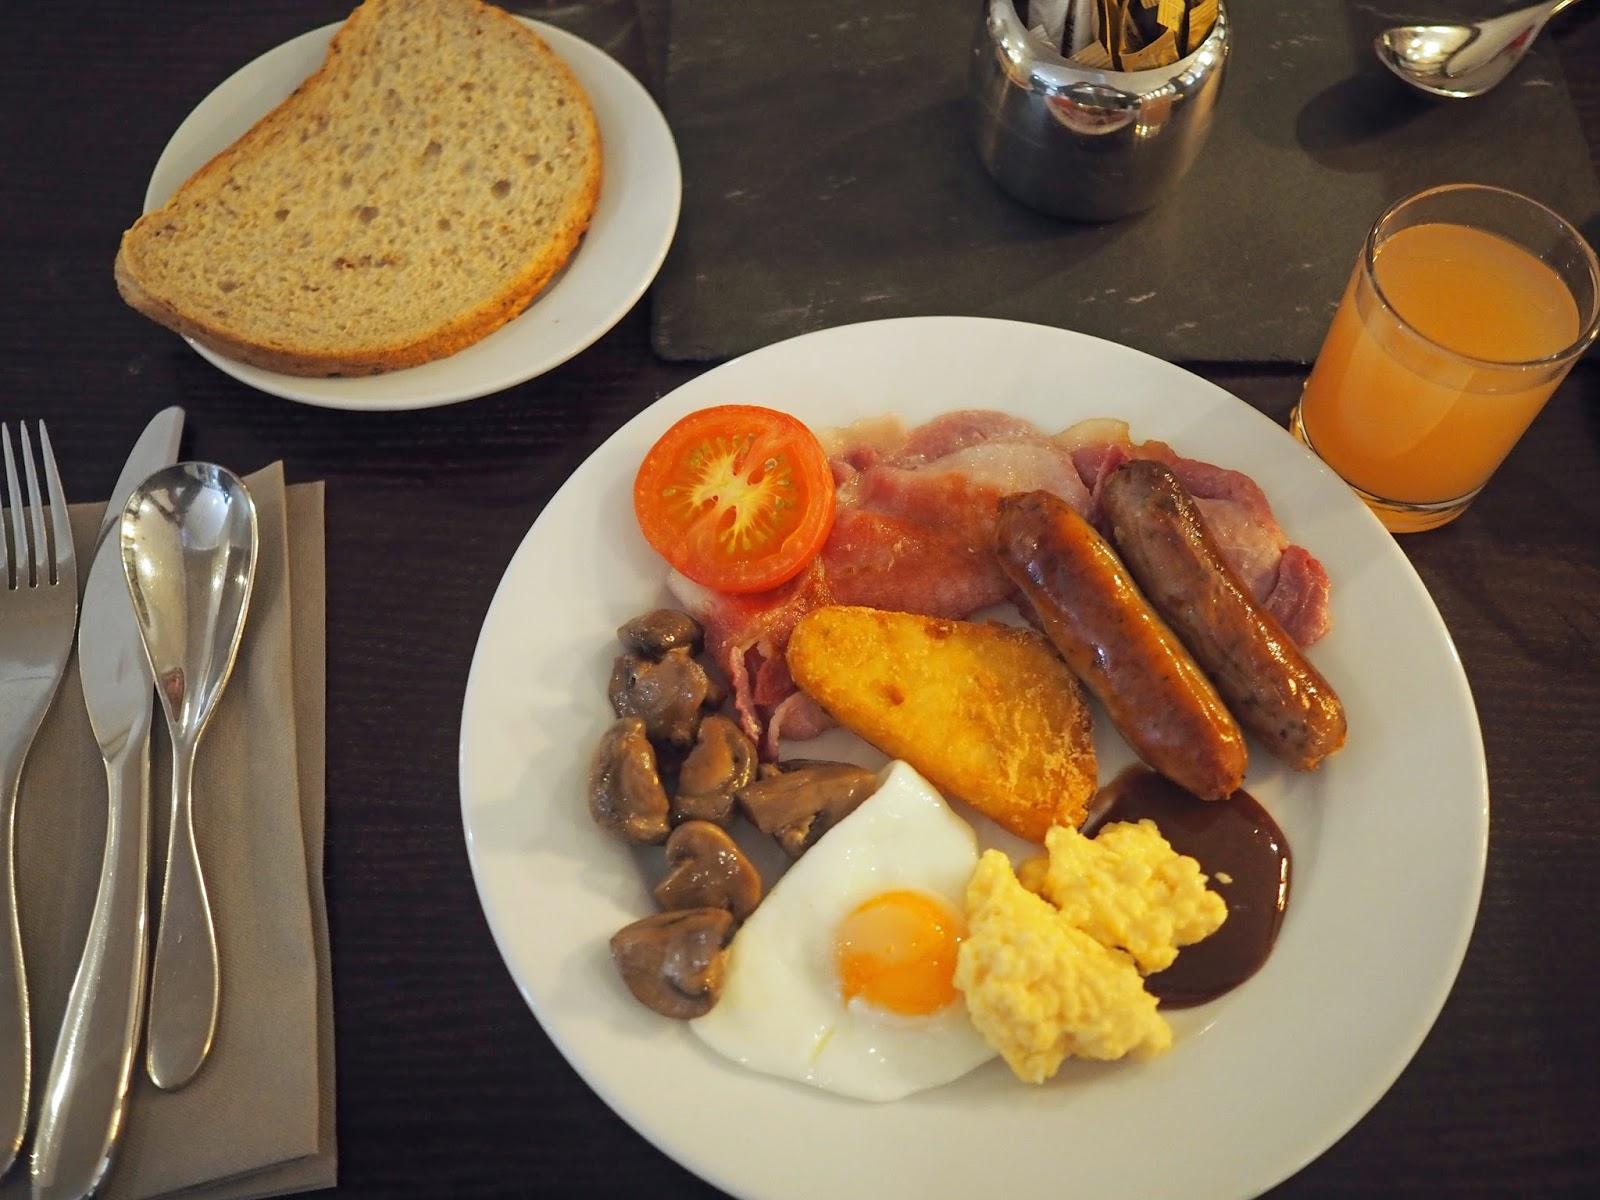 Cooked breakfast buffet, York city centre hotel, York. Monkbar